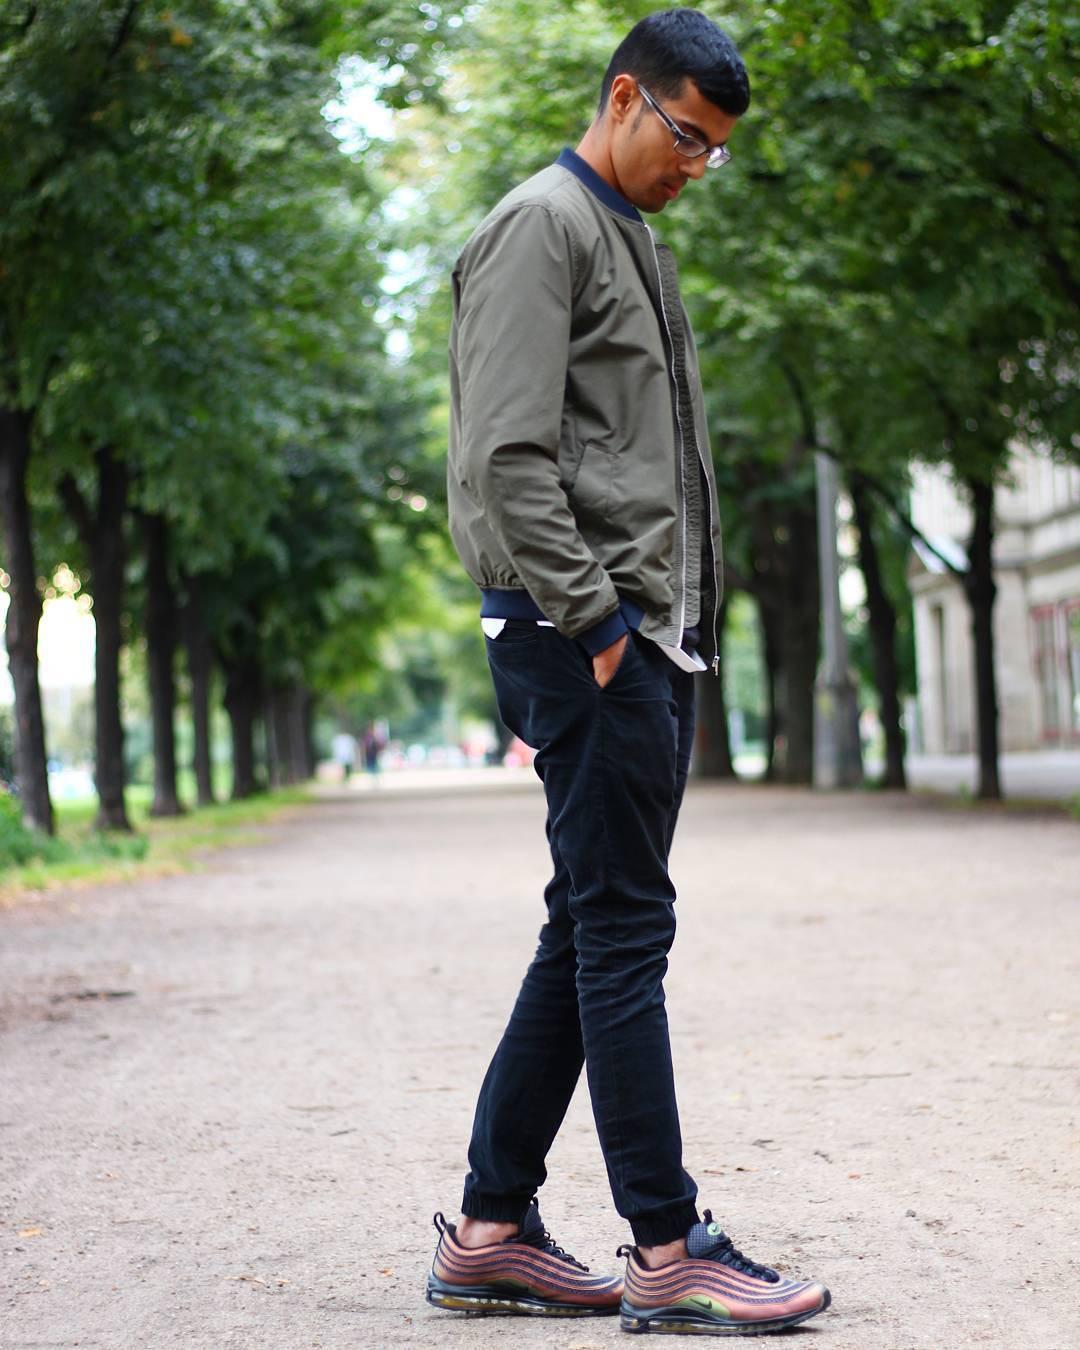 nike air max 97 fashion